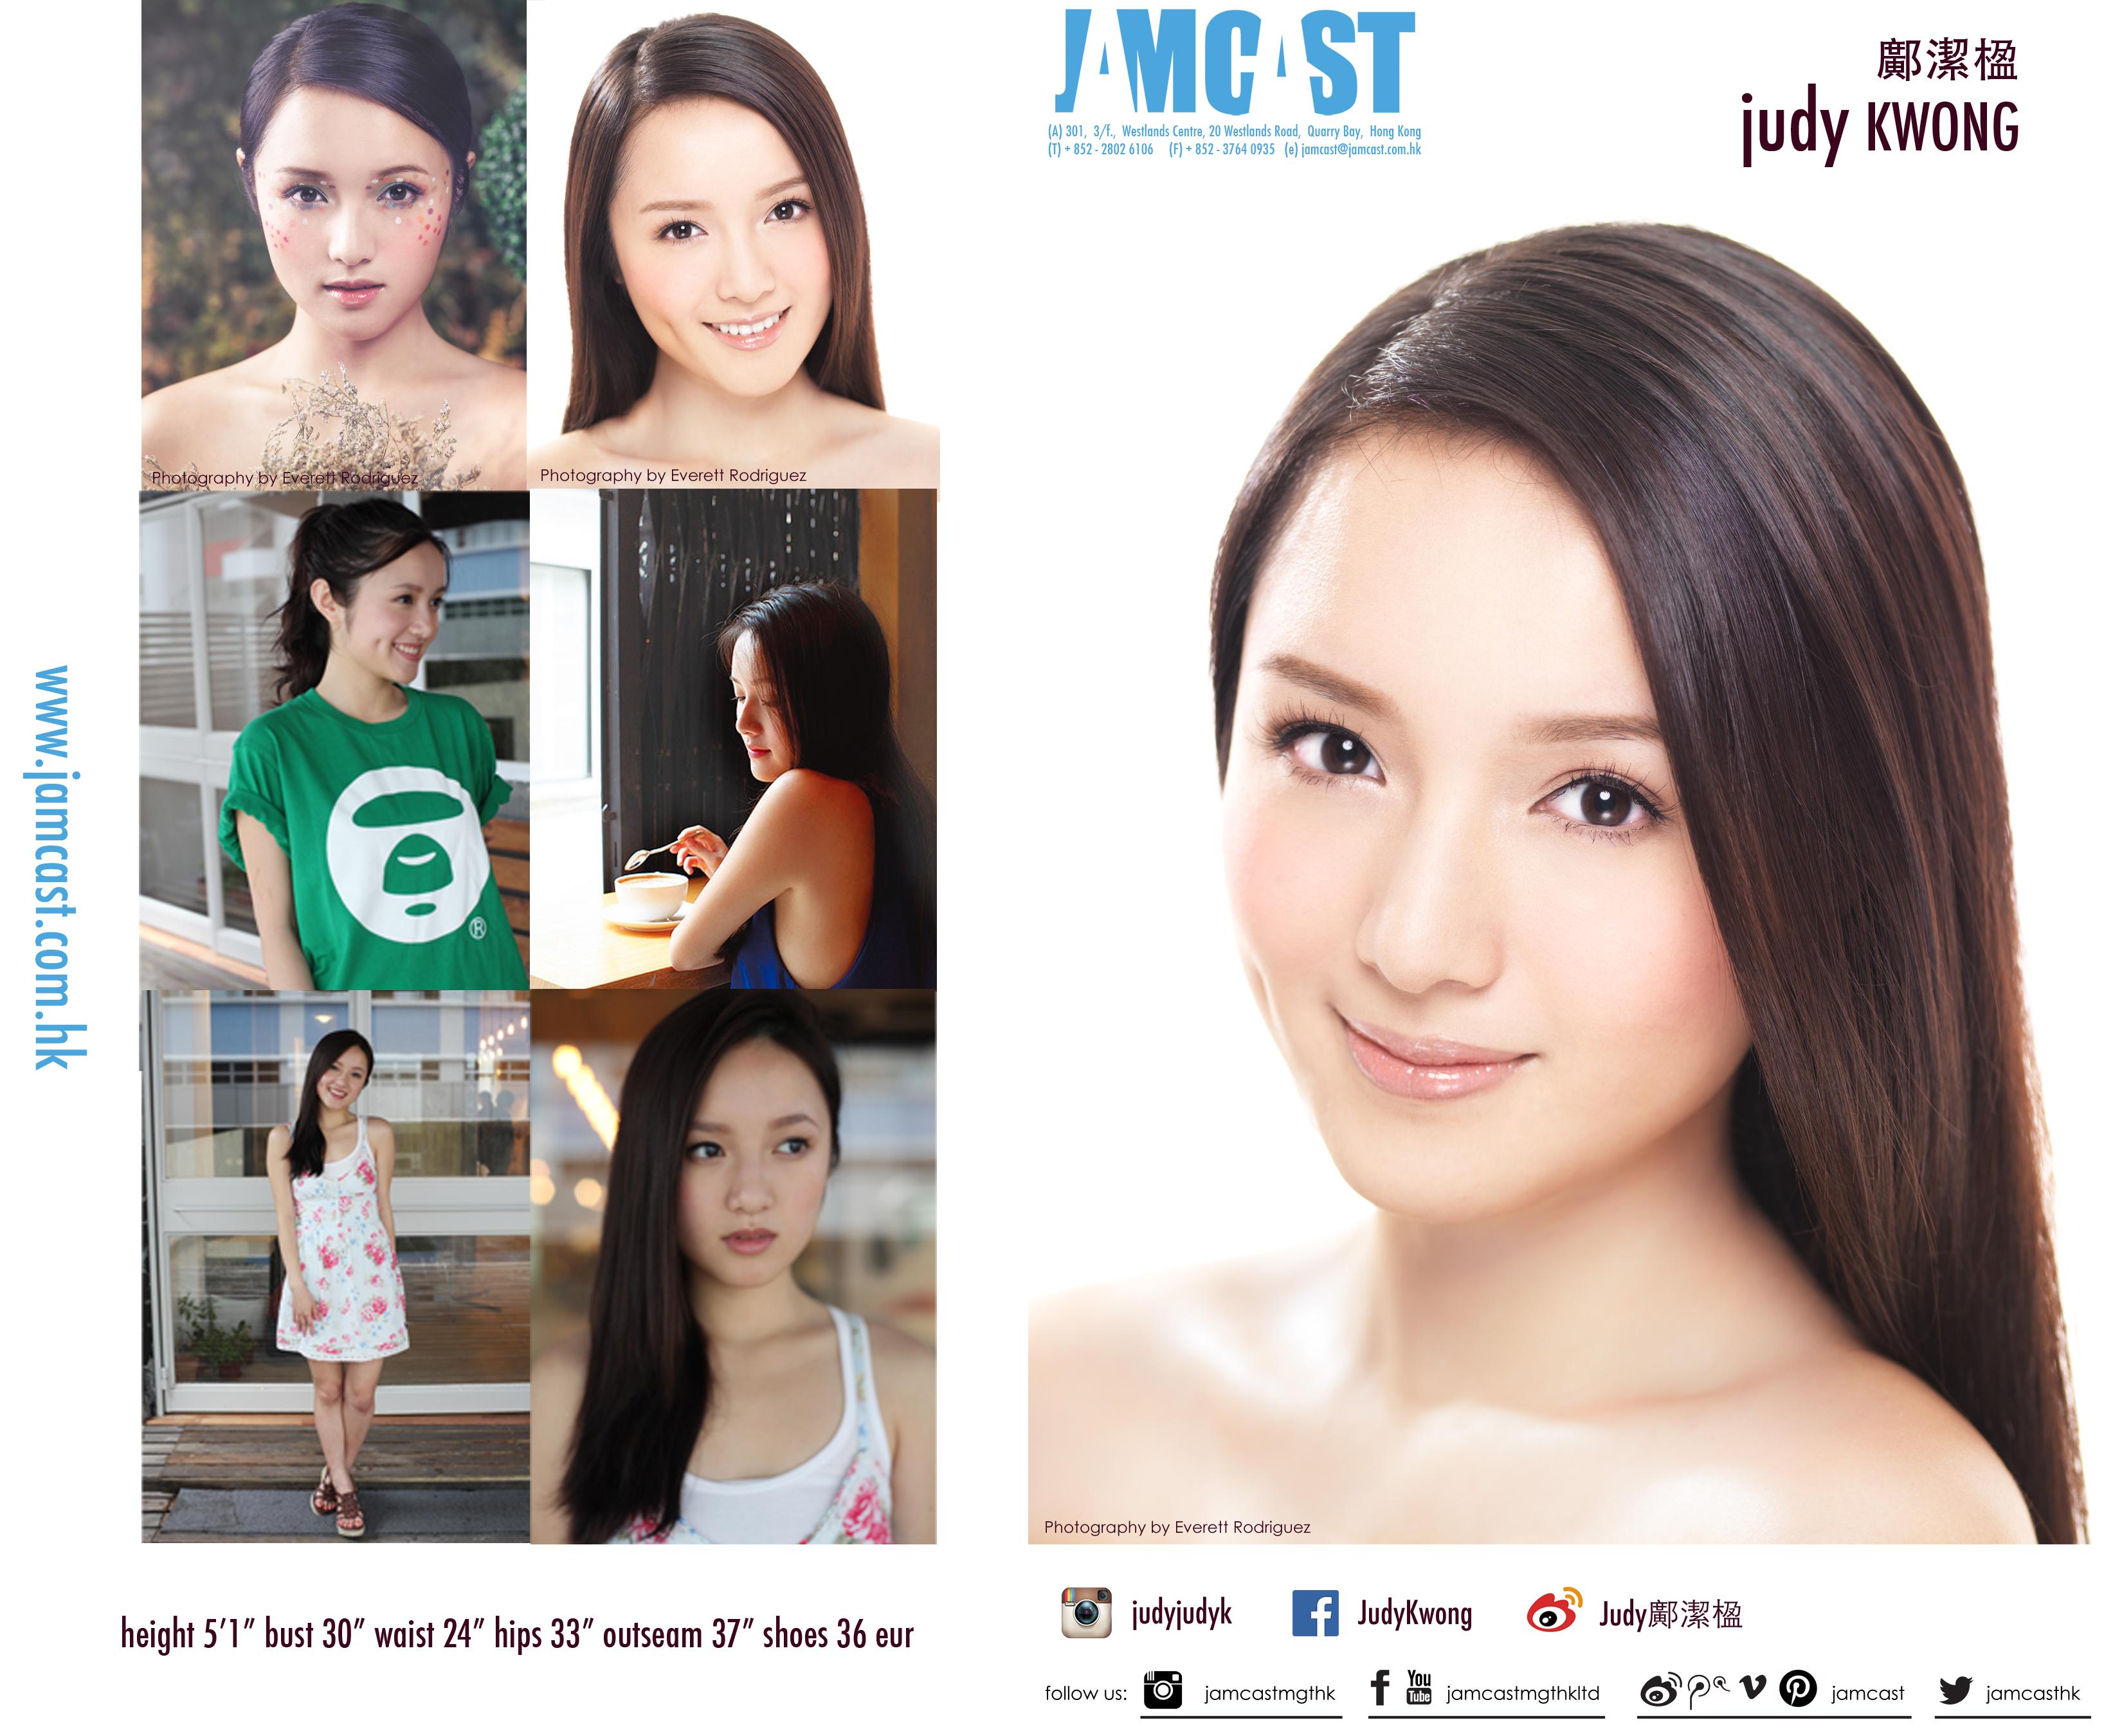 Judy Kwong Card